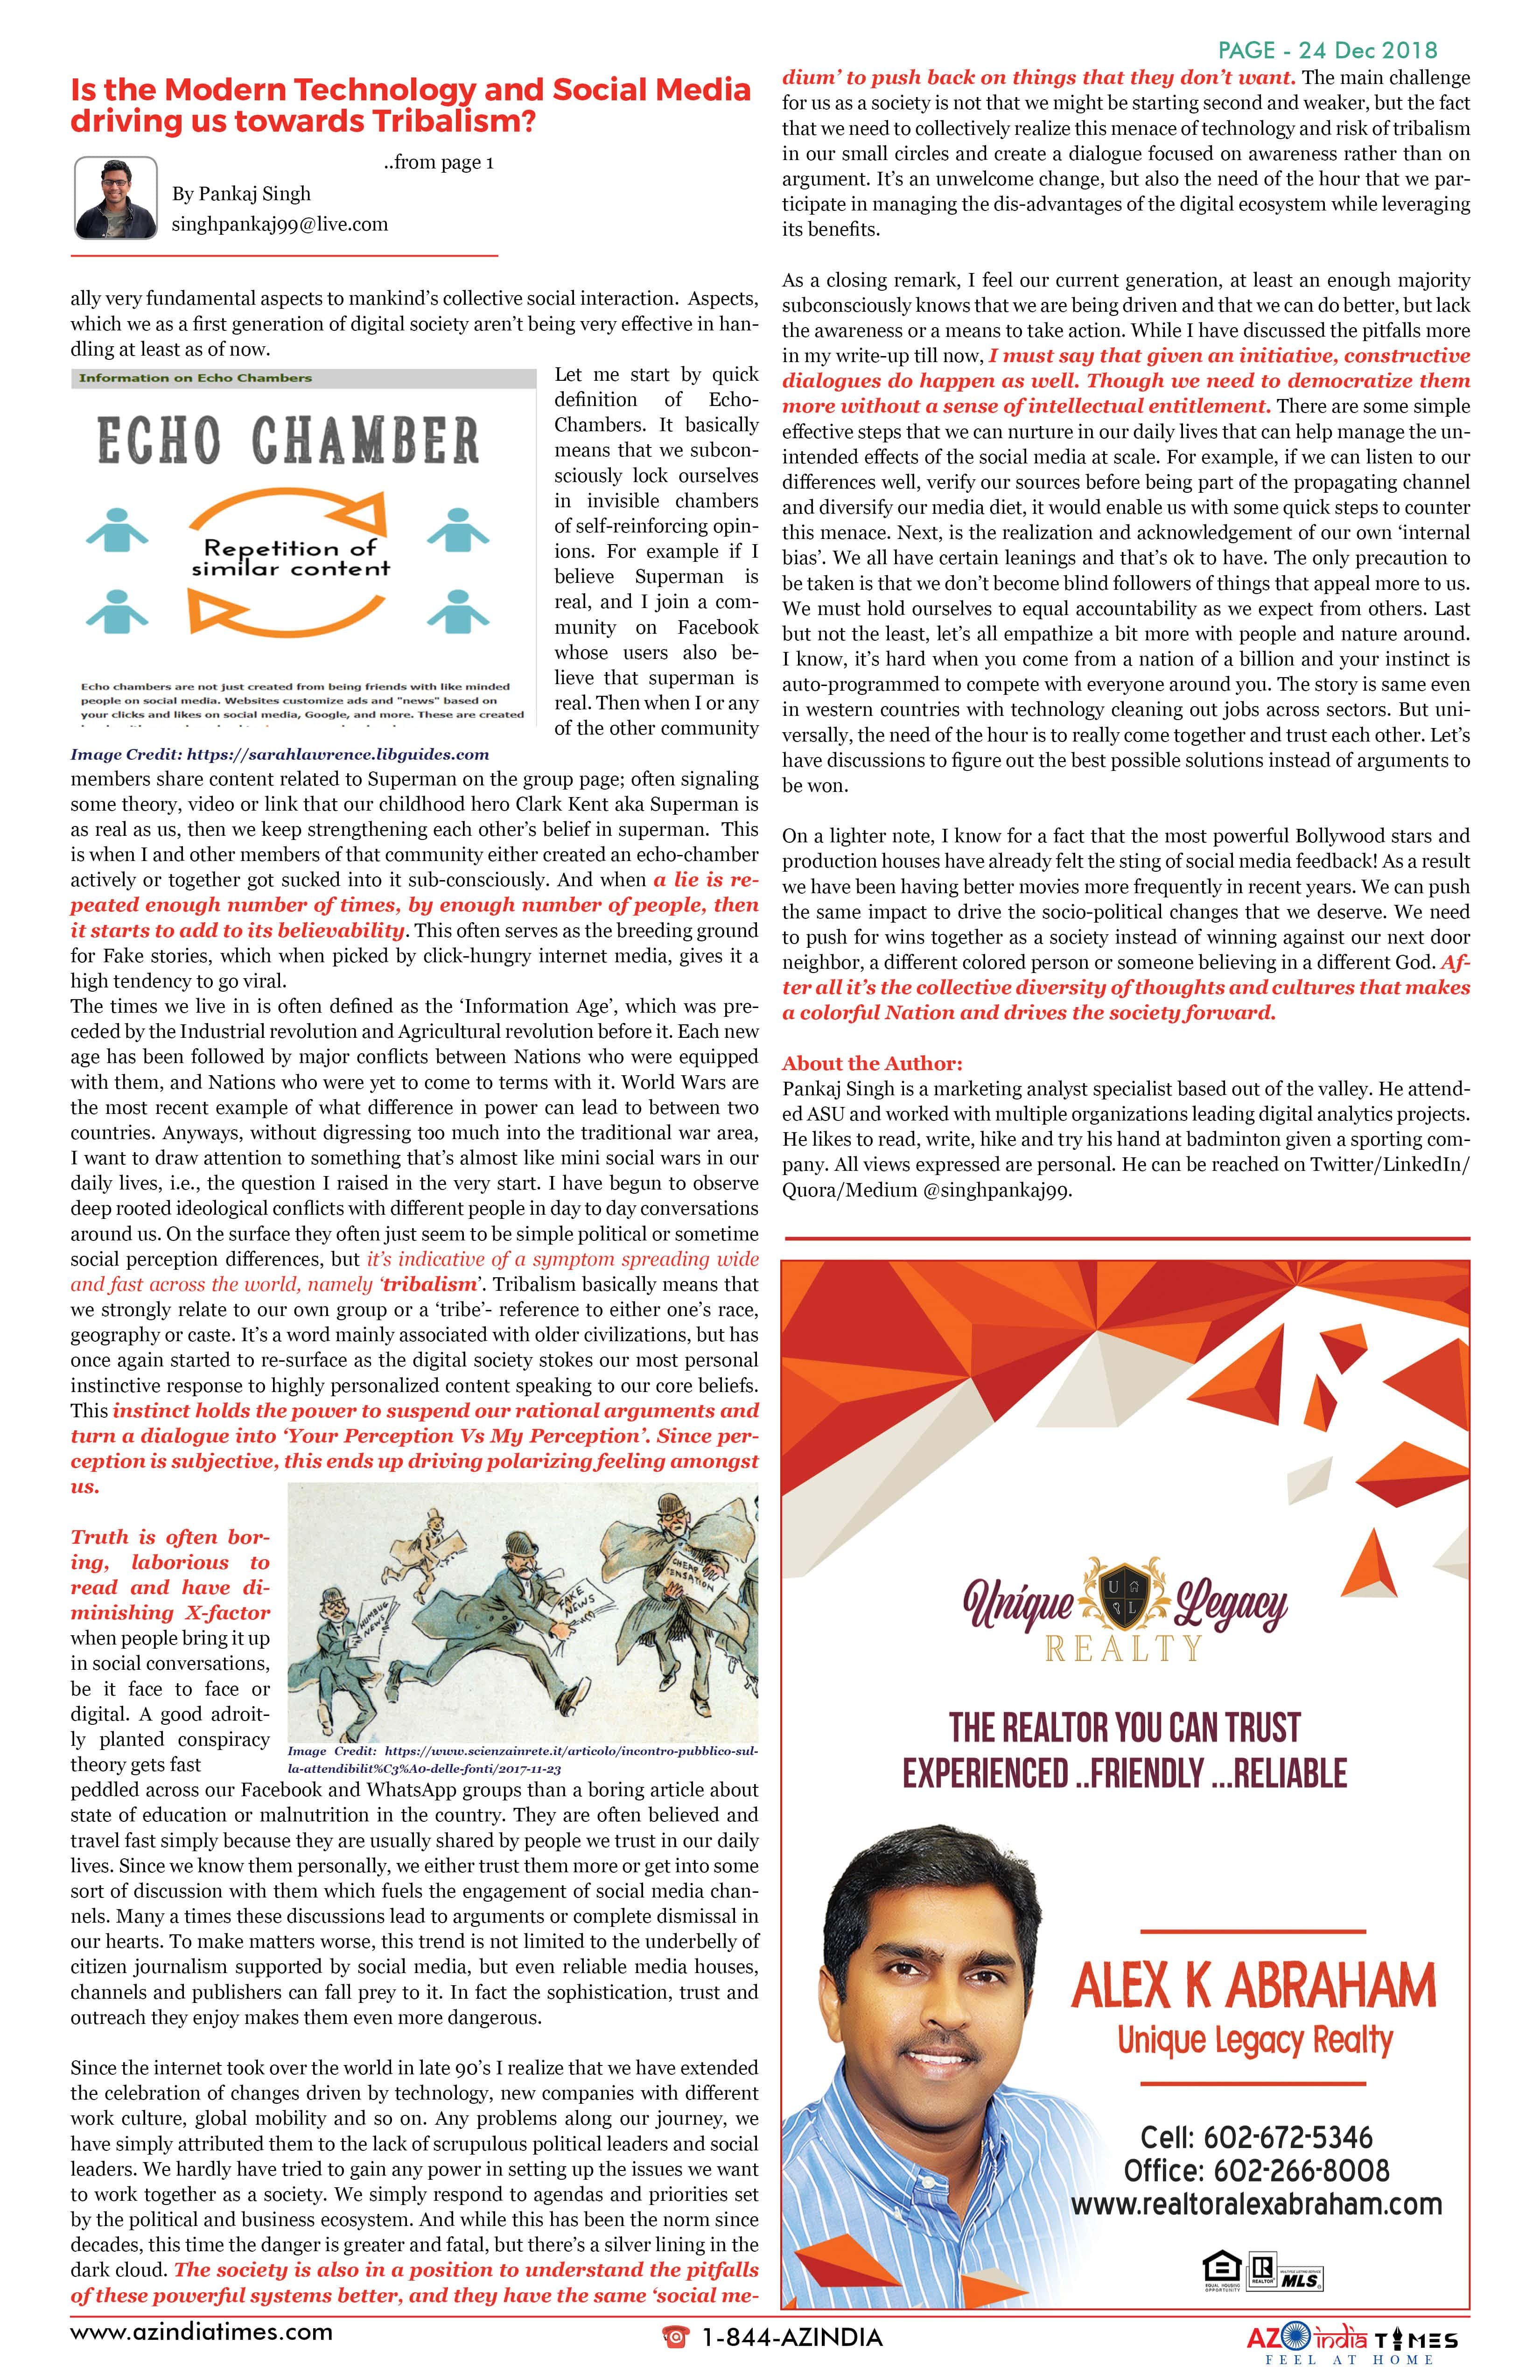 AZ INDIA DECEMBER EDITION 24